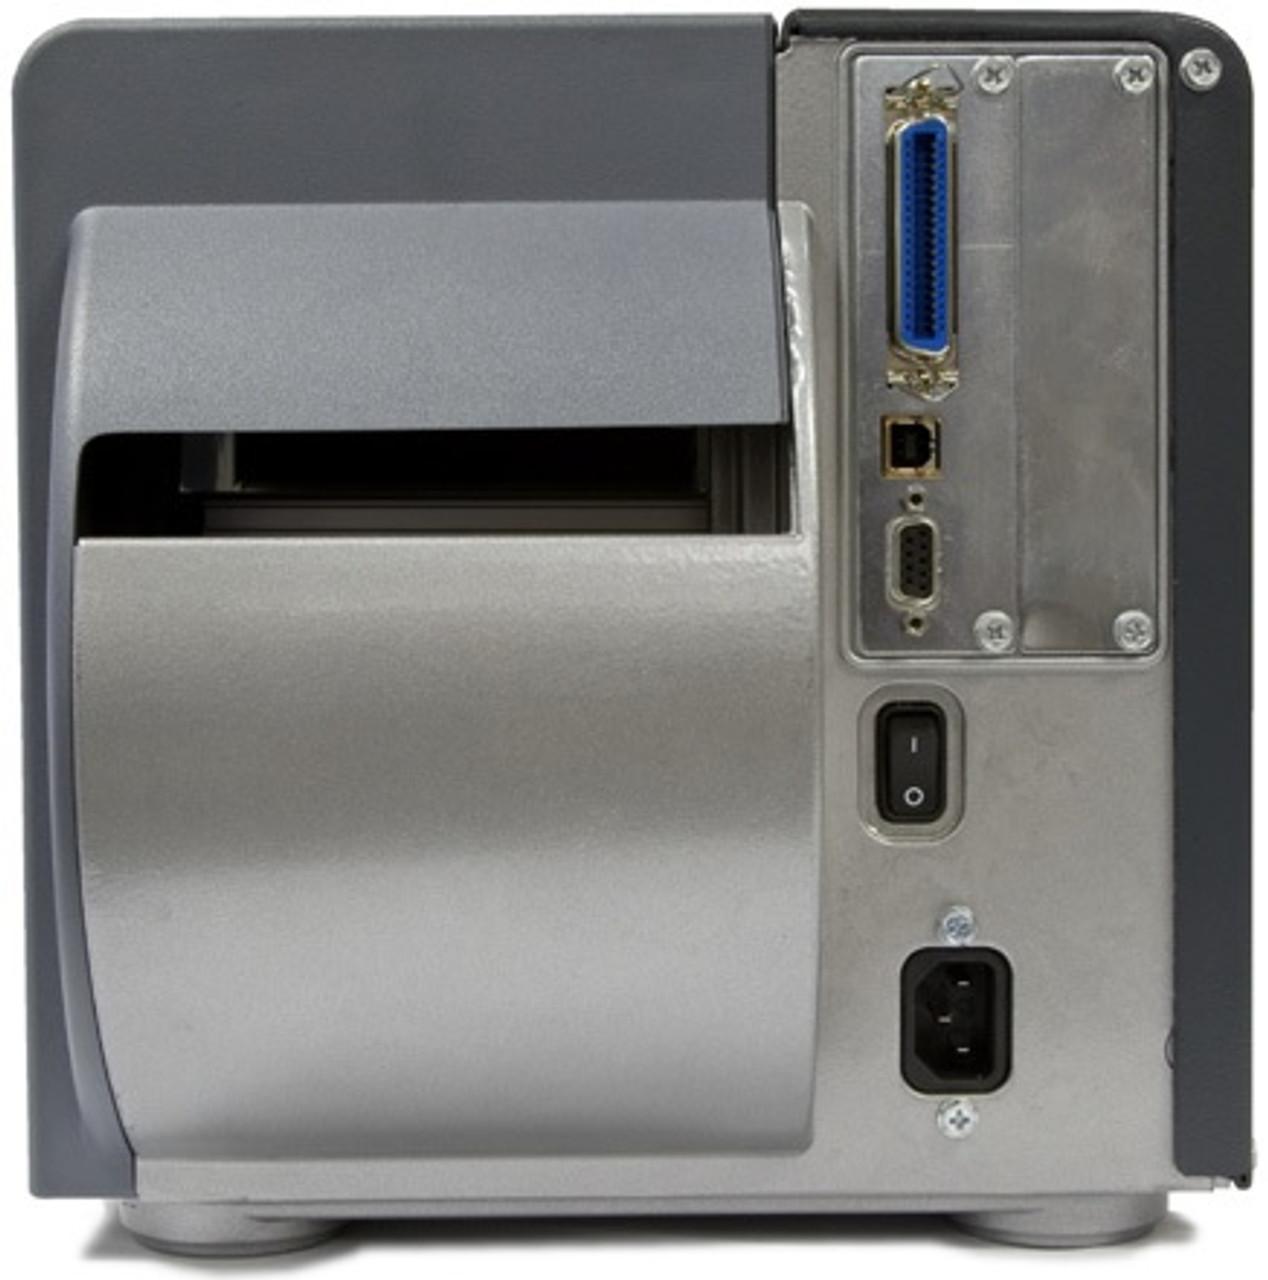 Mettler-Toledo APR710 Desktop Direct Thermal Thermal Transfer Label Printer - 64068861